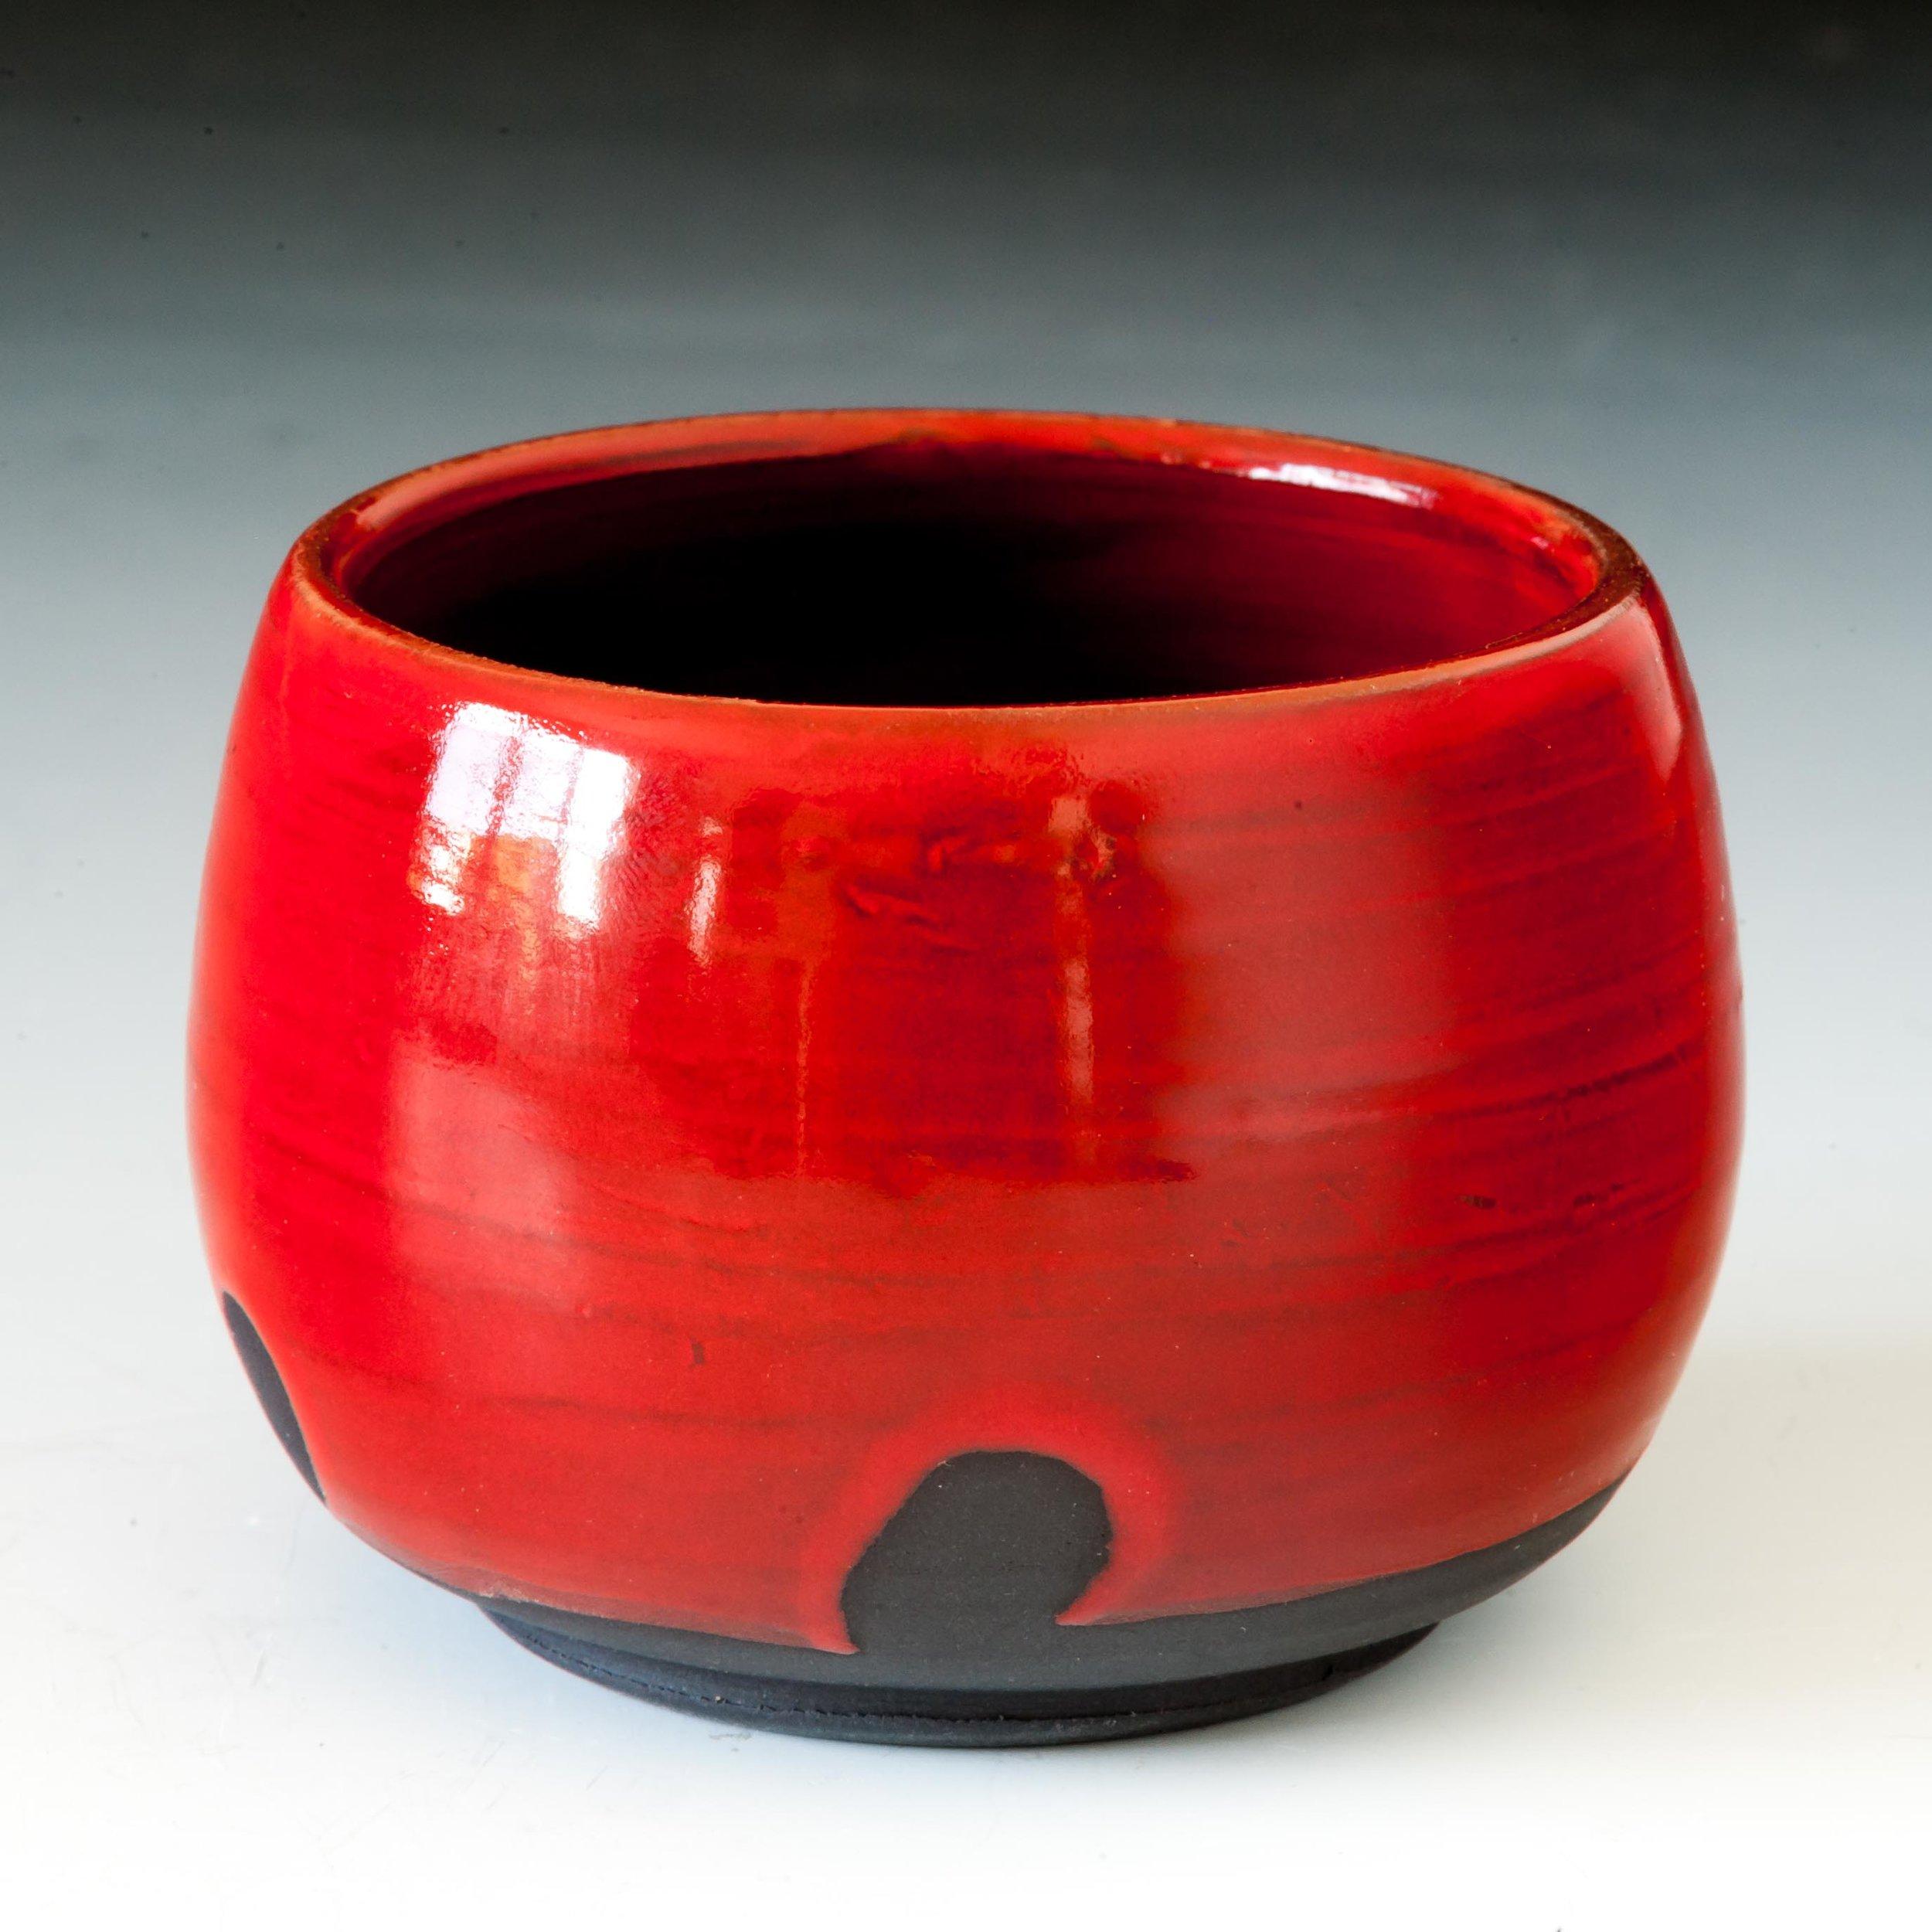 cups on gradient-3305.jpg